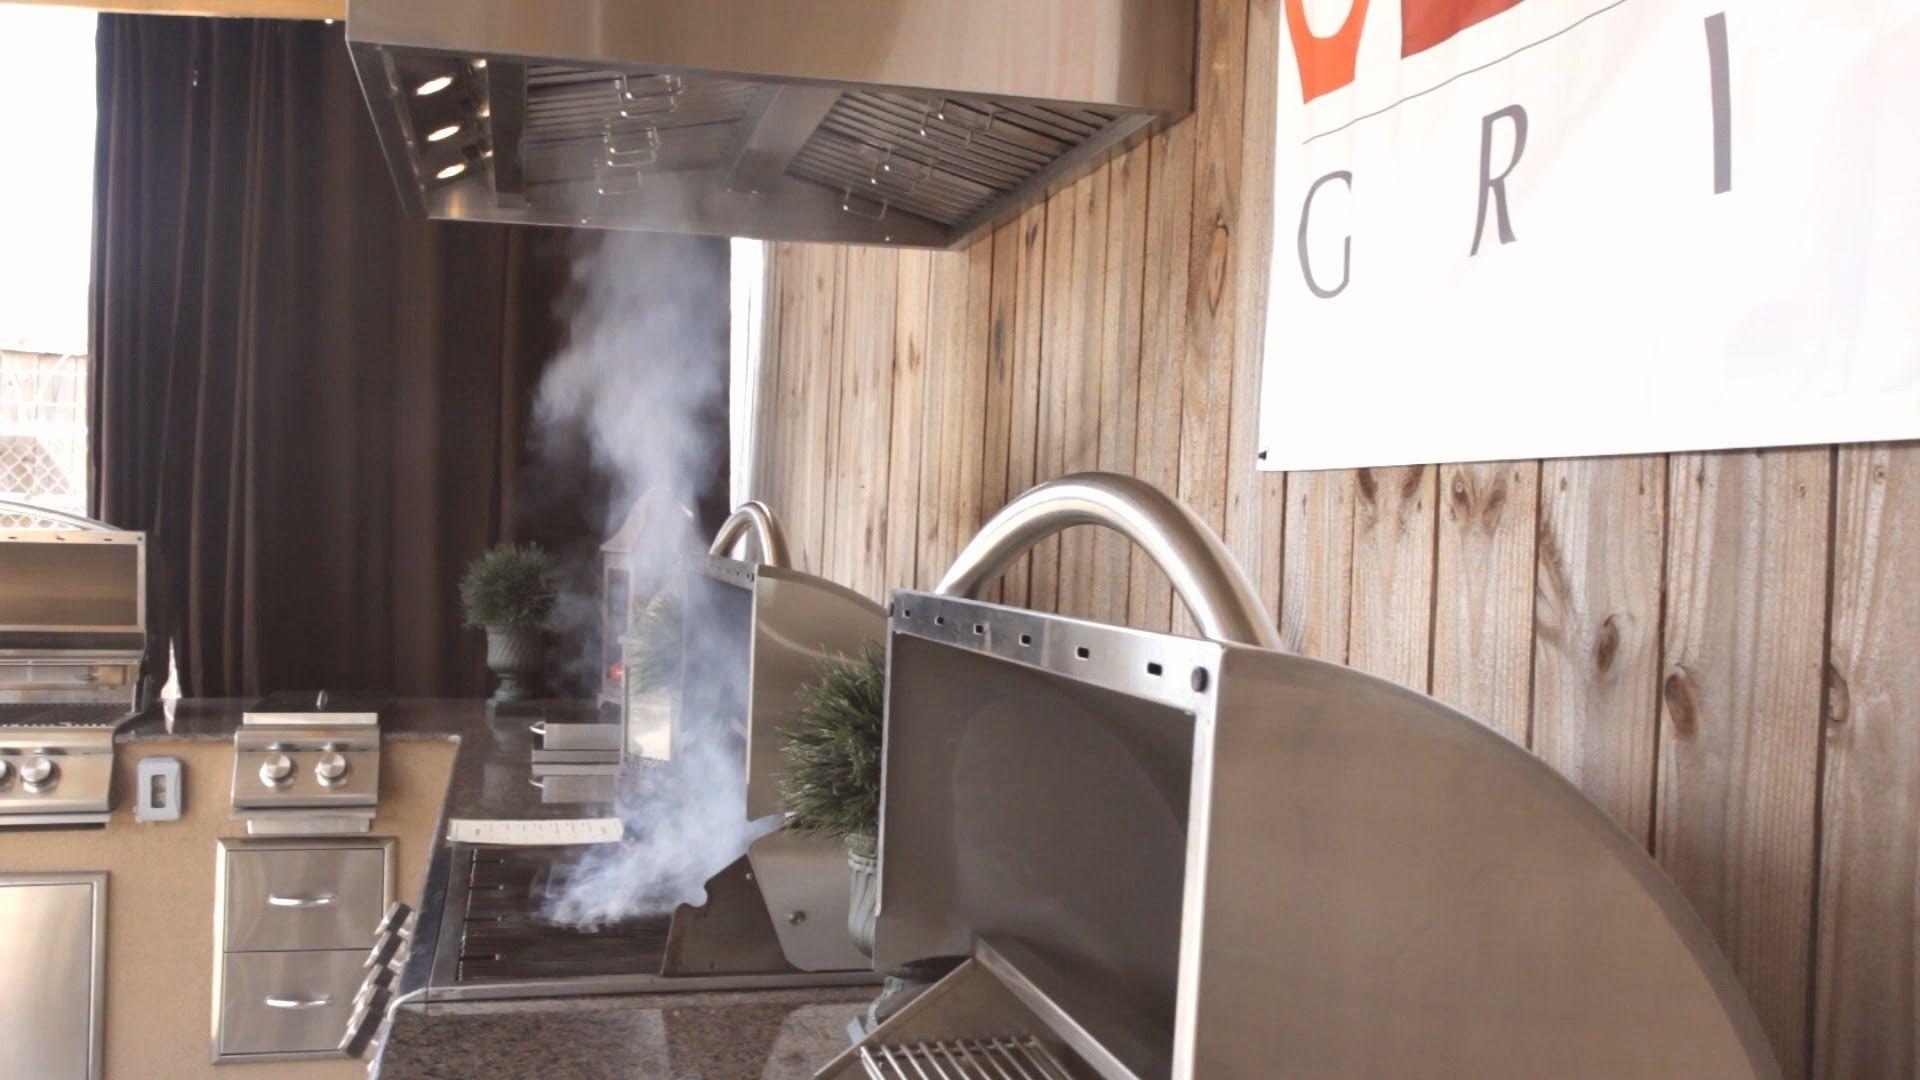 Outdoor exhaust fan for bbq urresults pinterest